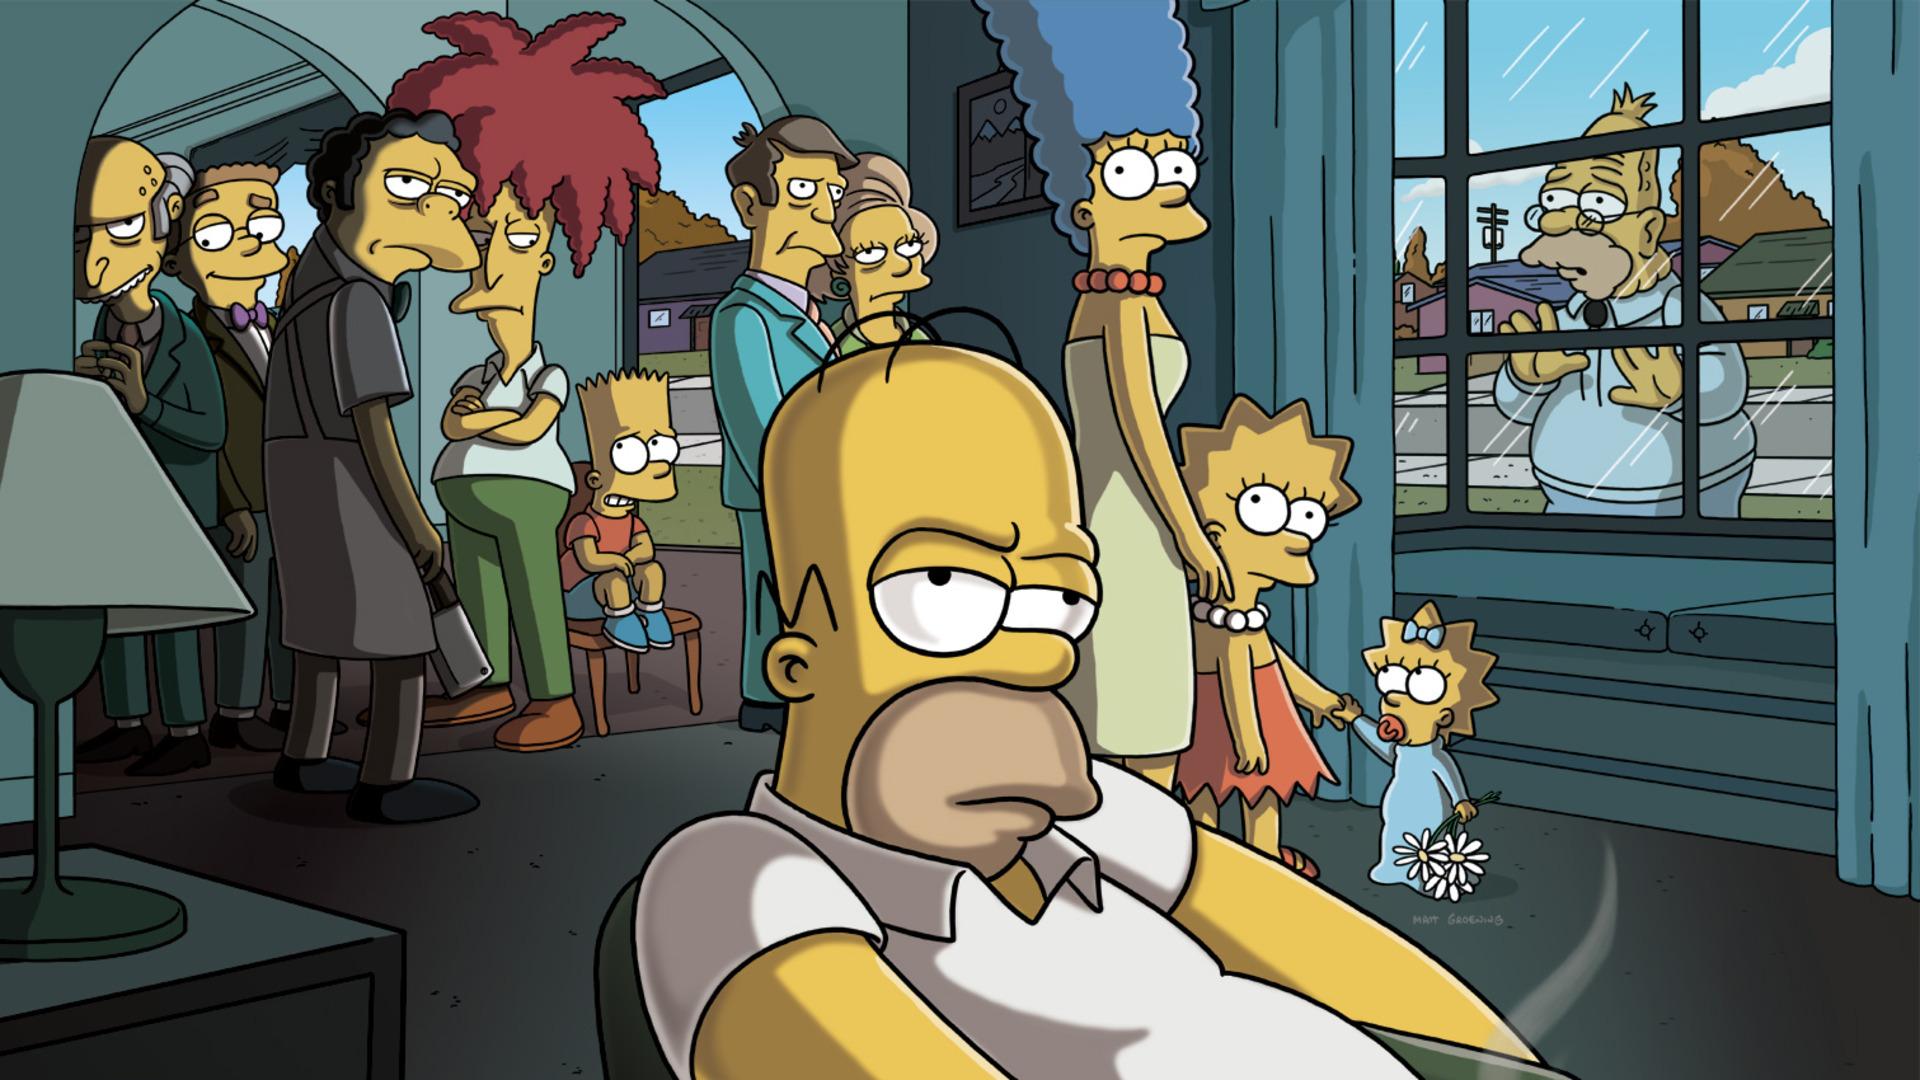 Os Simpsons Papel de Parede HD   Plano de Fundo